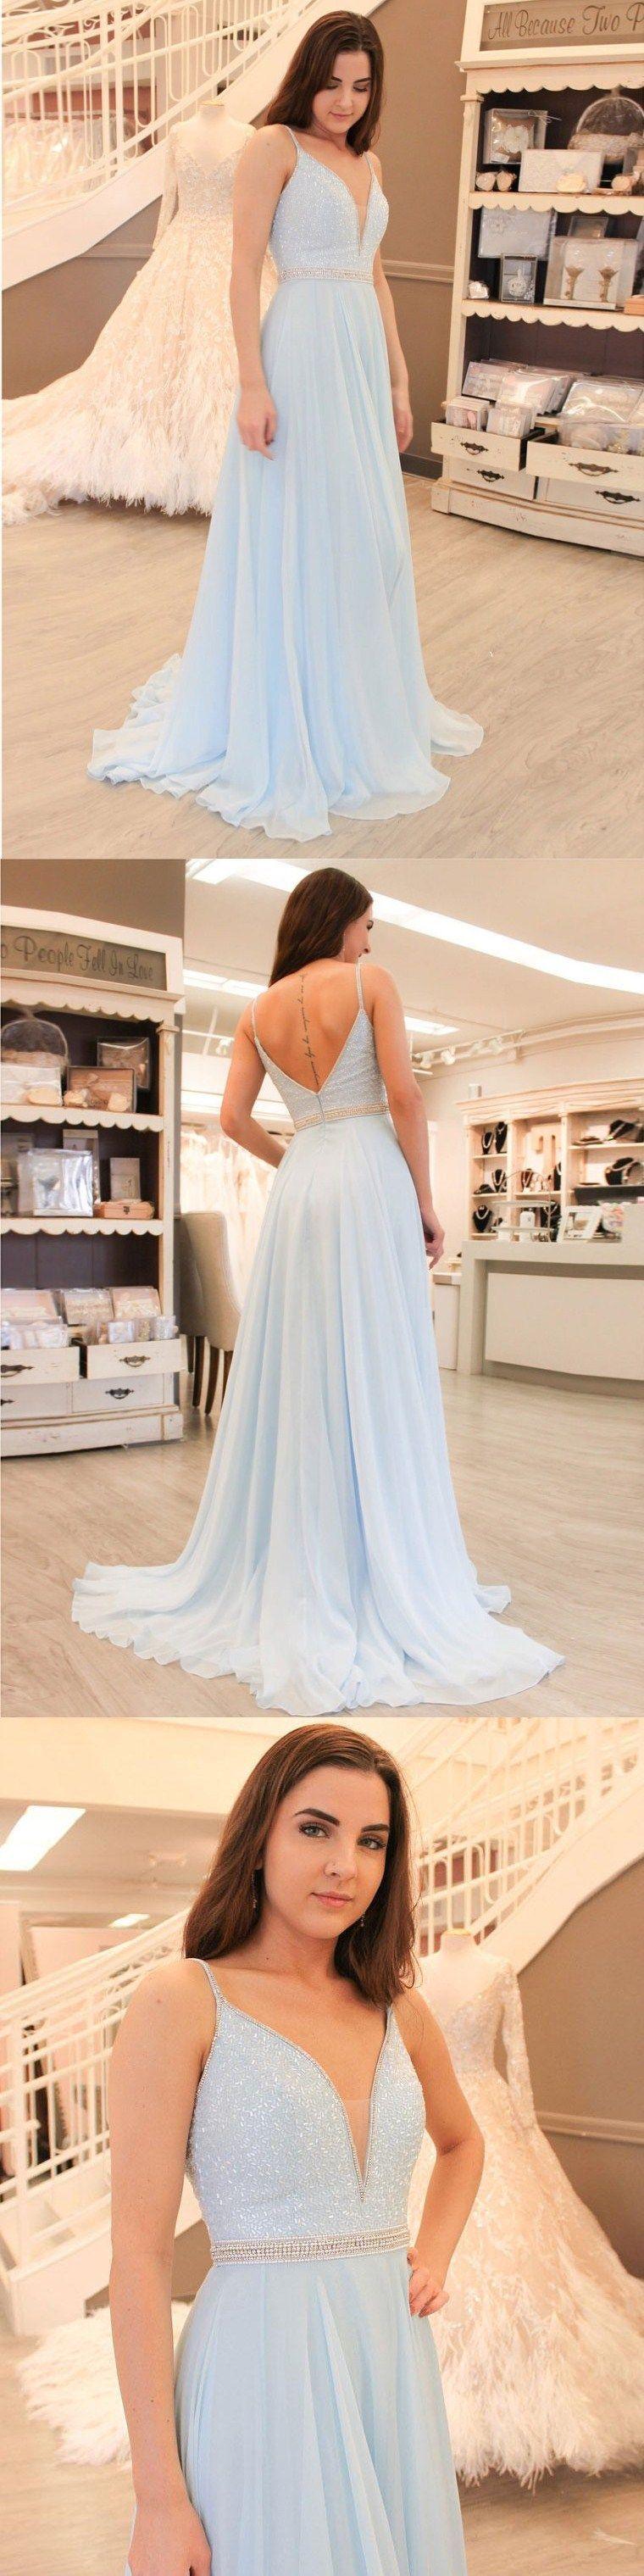 Prom dresses longprom dresses prom dresses modest evening